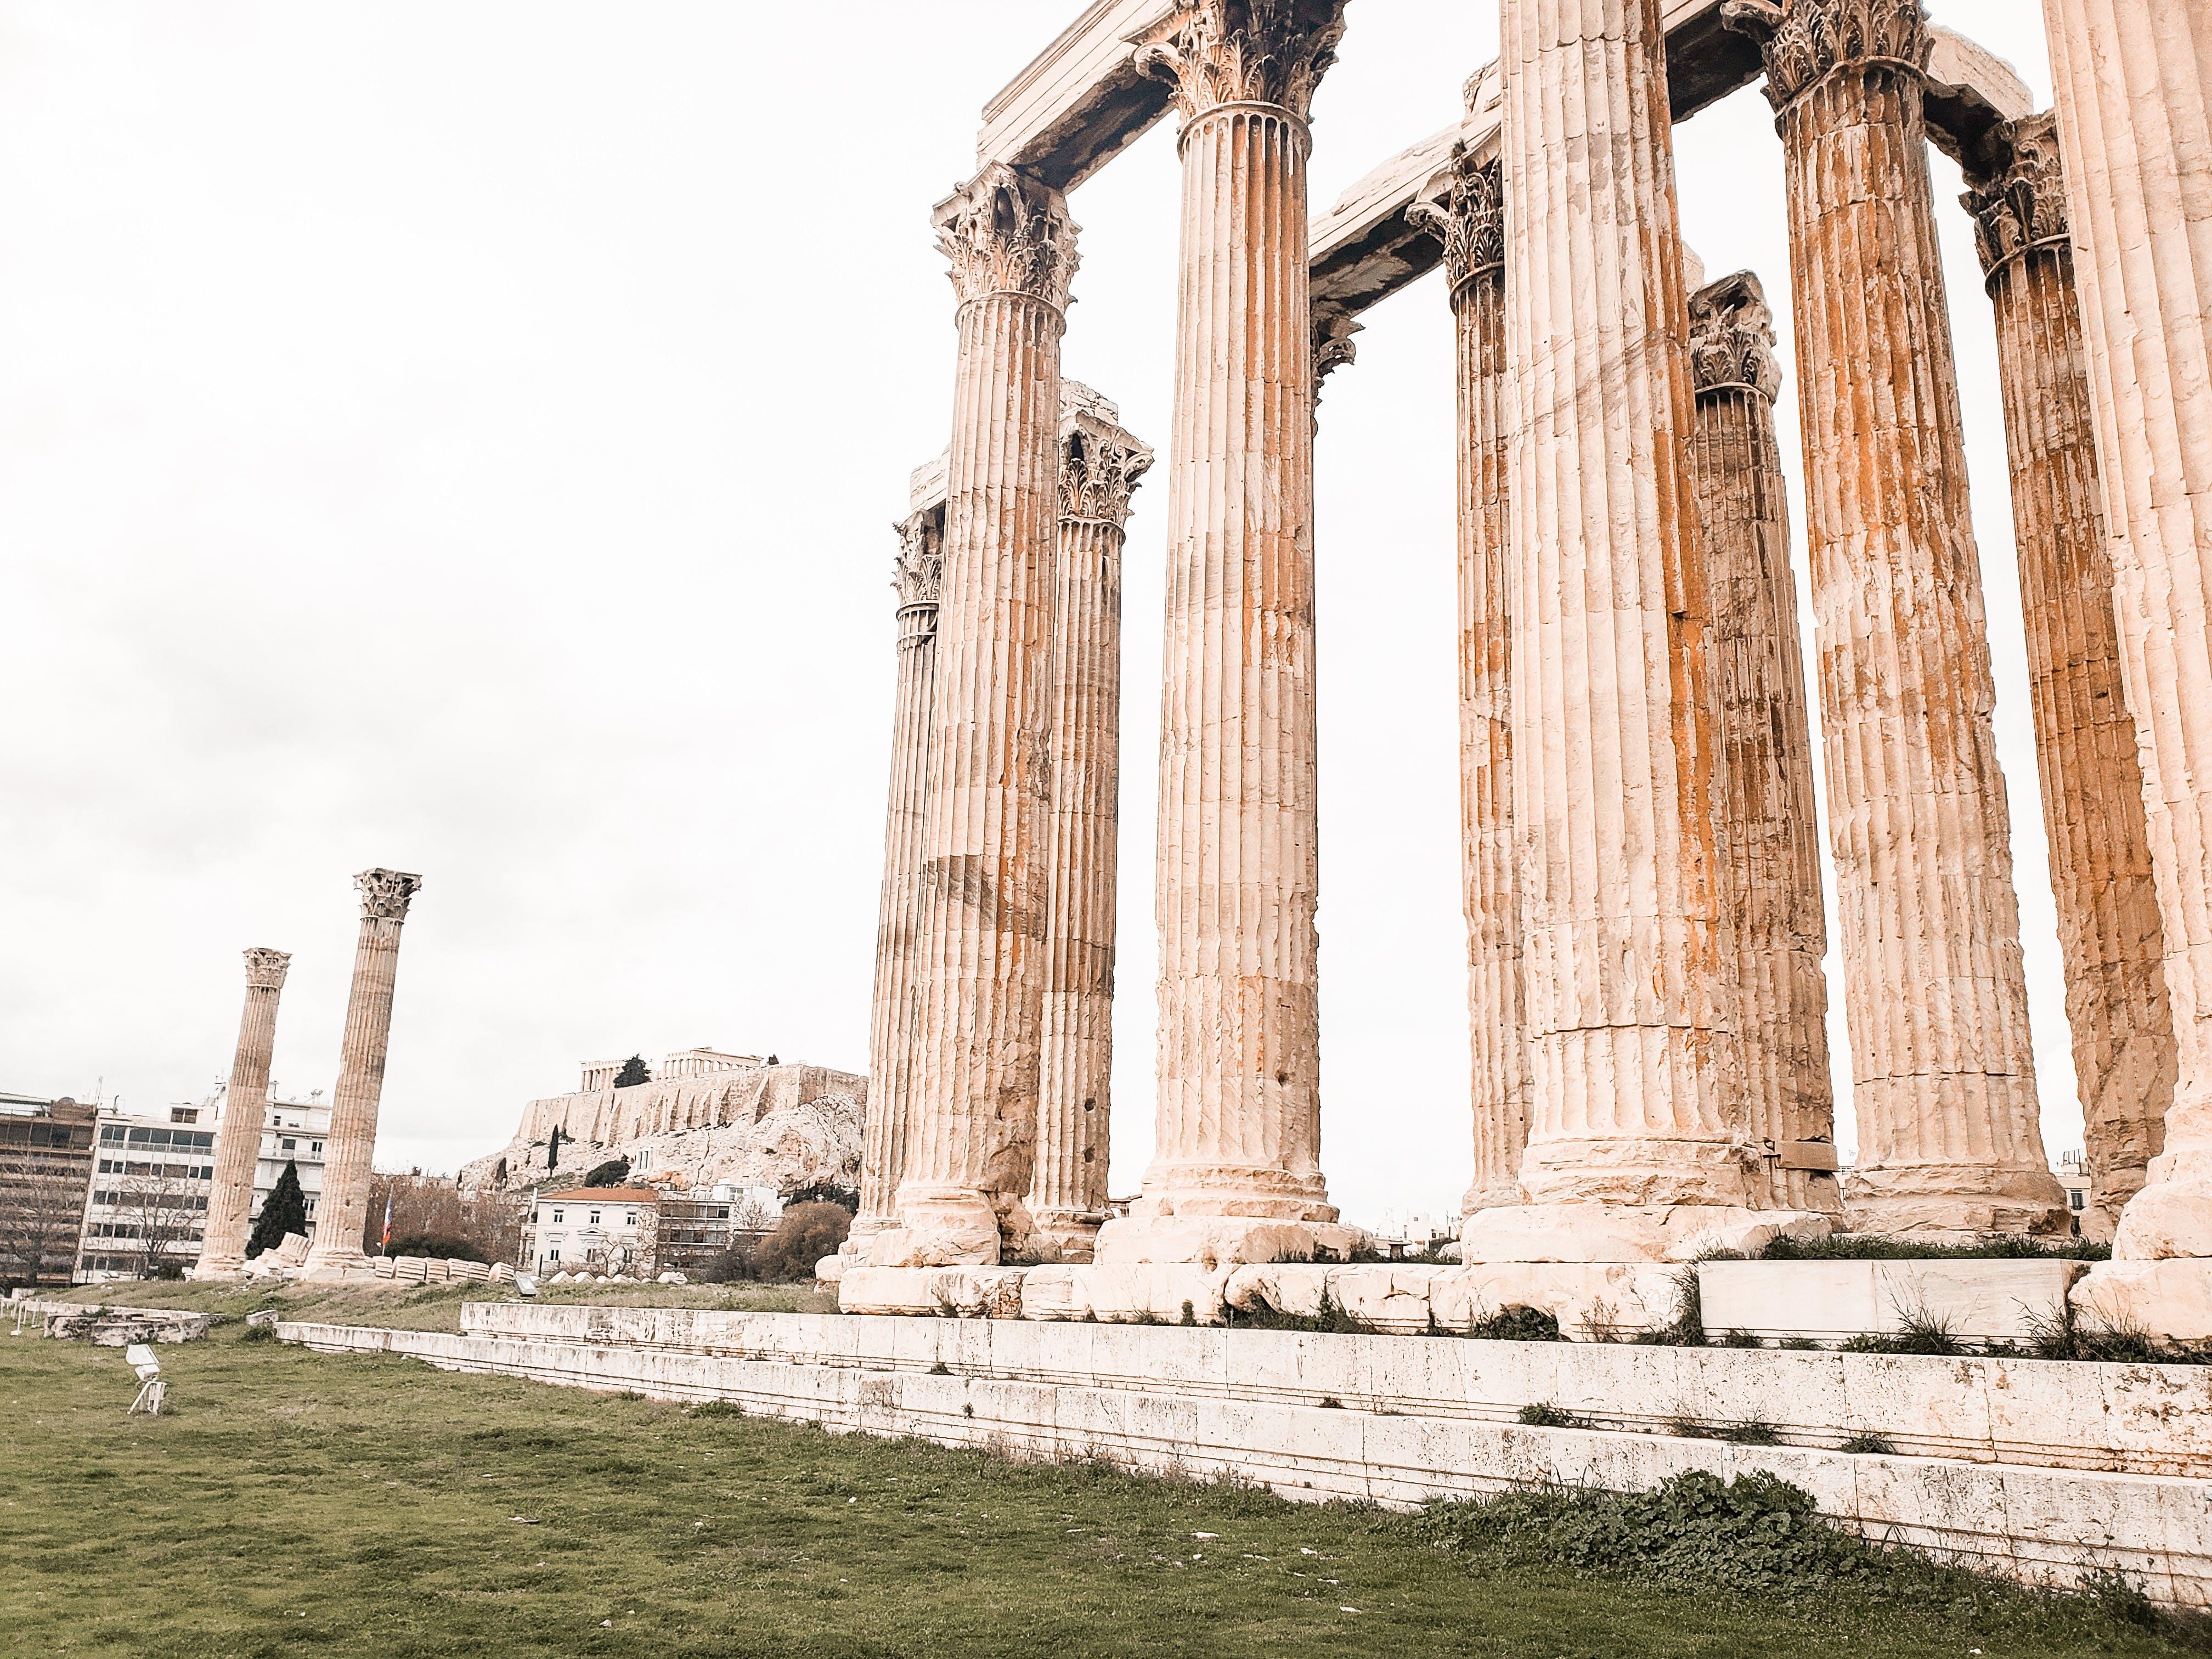 acropolis, architecture, athens